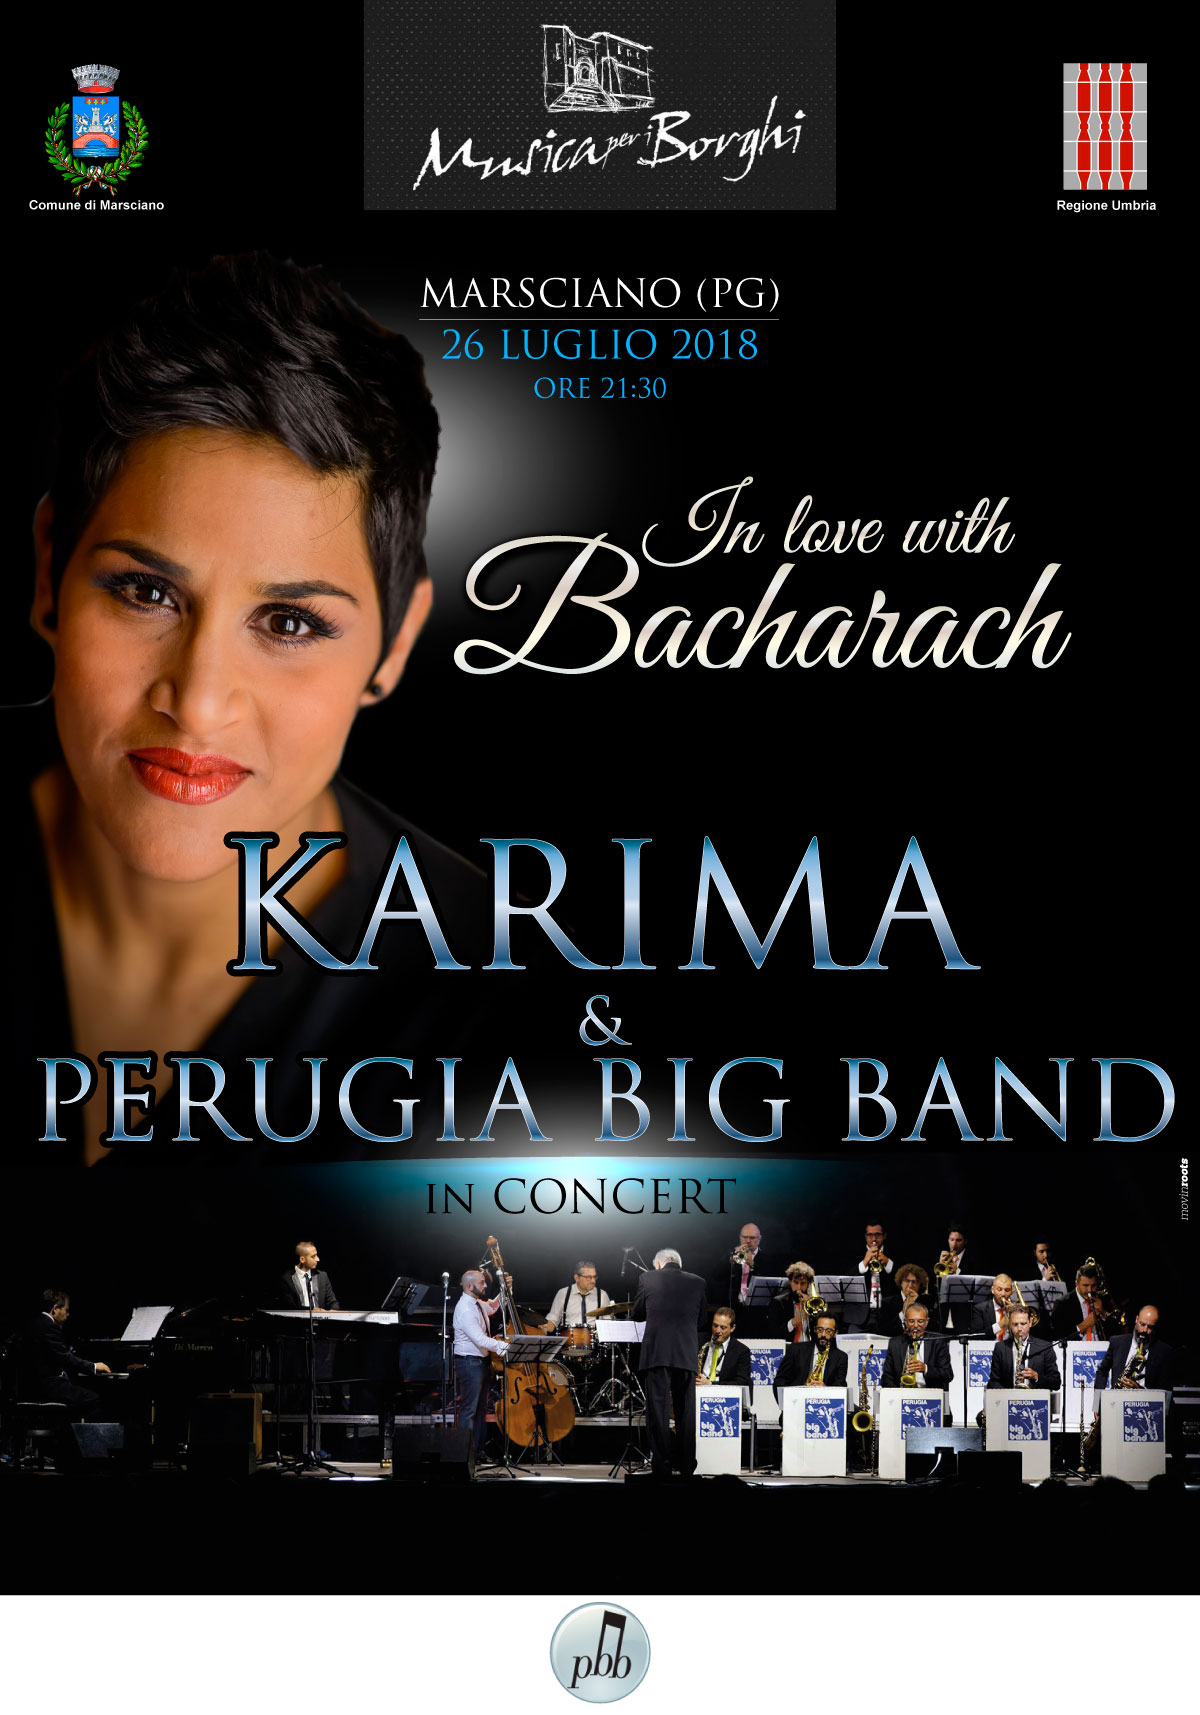 Karima Perugia Big Band Musica per i Borghi MARSCIANO